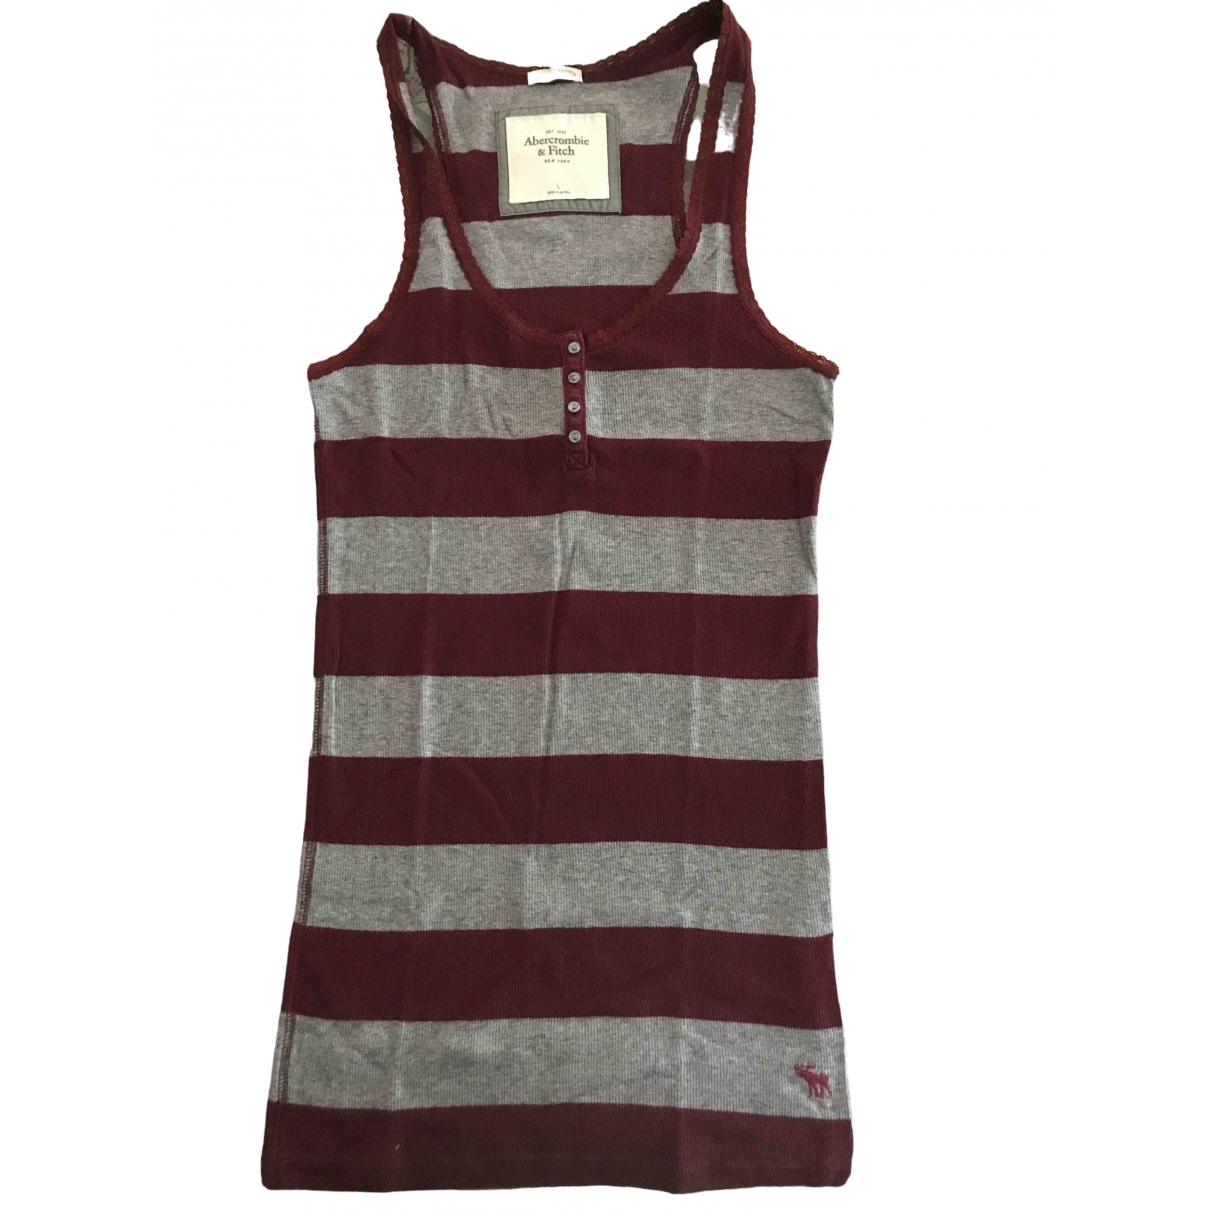 Camiseta sin mangas Abercrombie & Fitch